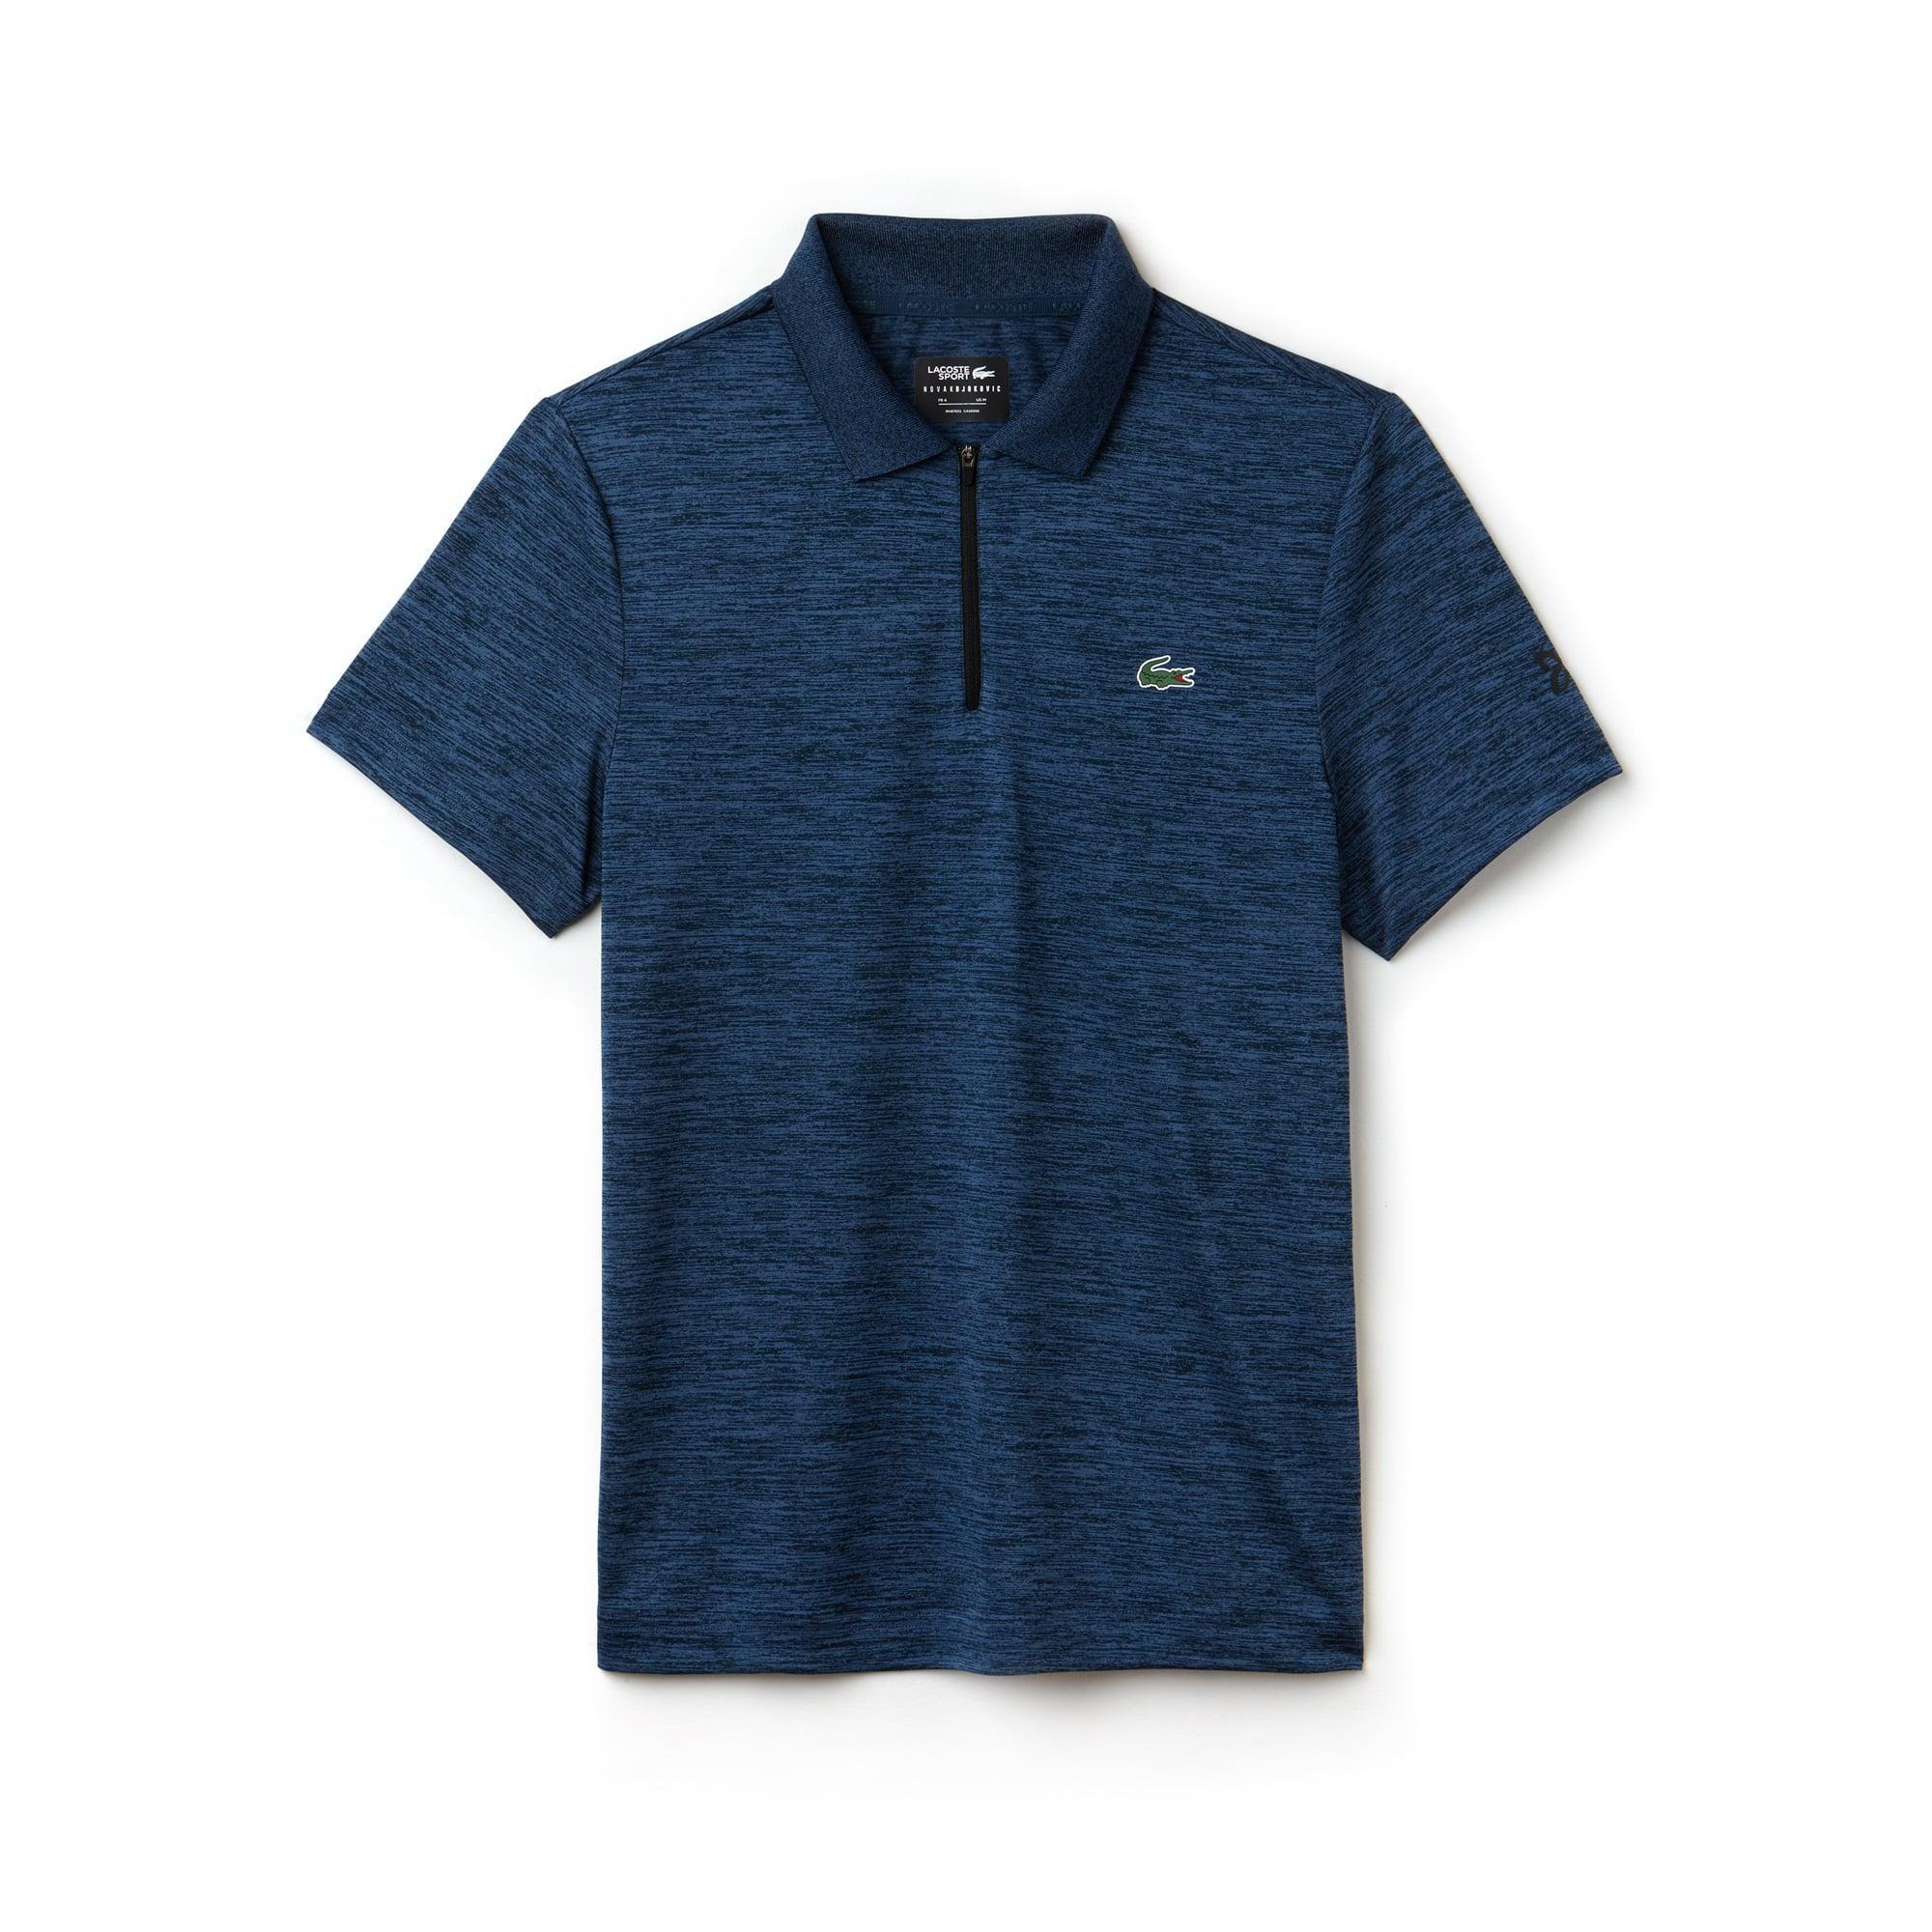 Polo Lacoste SPORT Collection Novak Djokovic - Off Court en jersey technique chiné